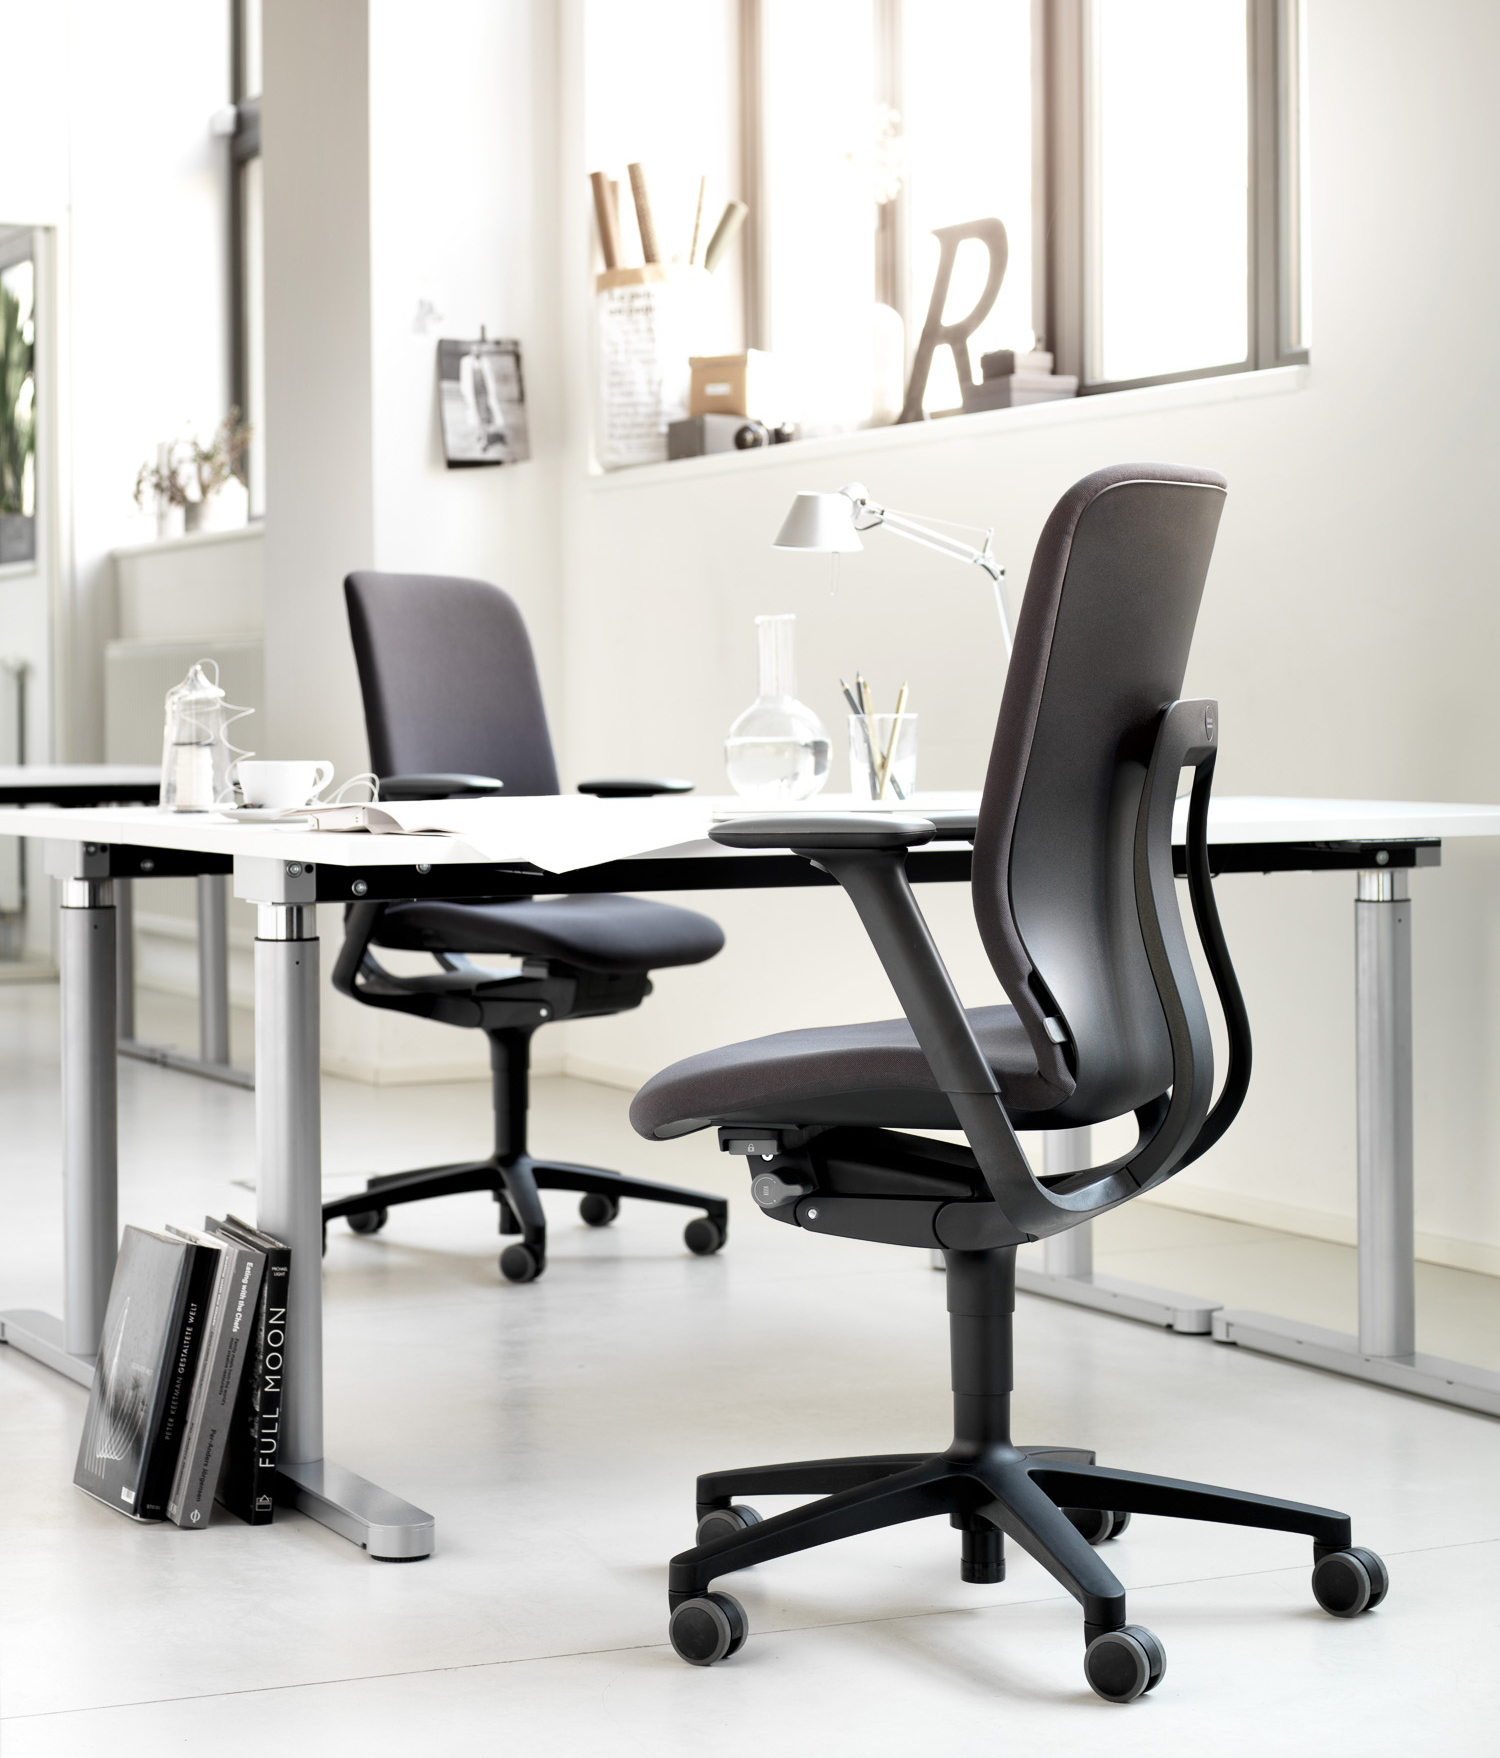 wilkhahn on preis beautiful sessel aus teak von wilkhahn er er set with wilkhahn on preis. Black Bedroom Furniture Sets. Home Design Ideas